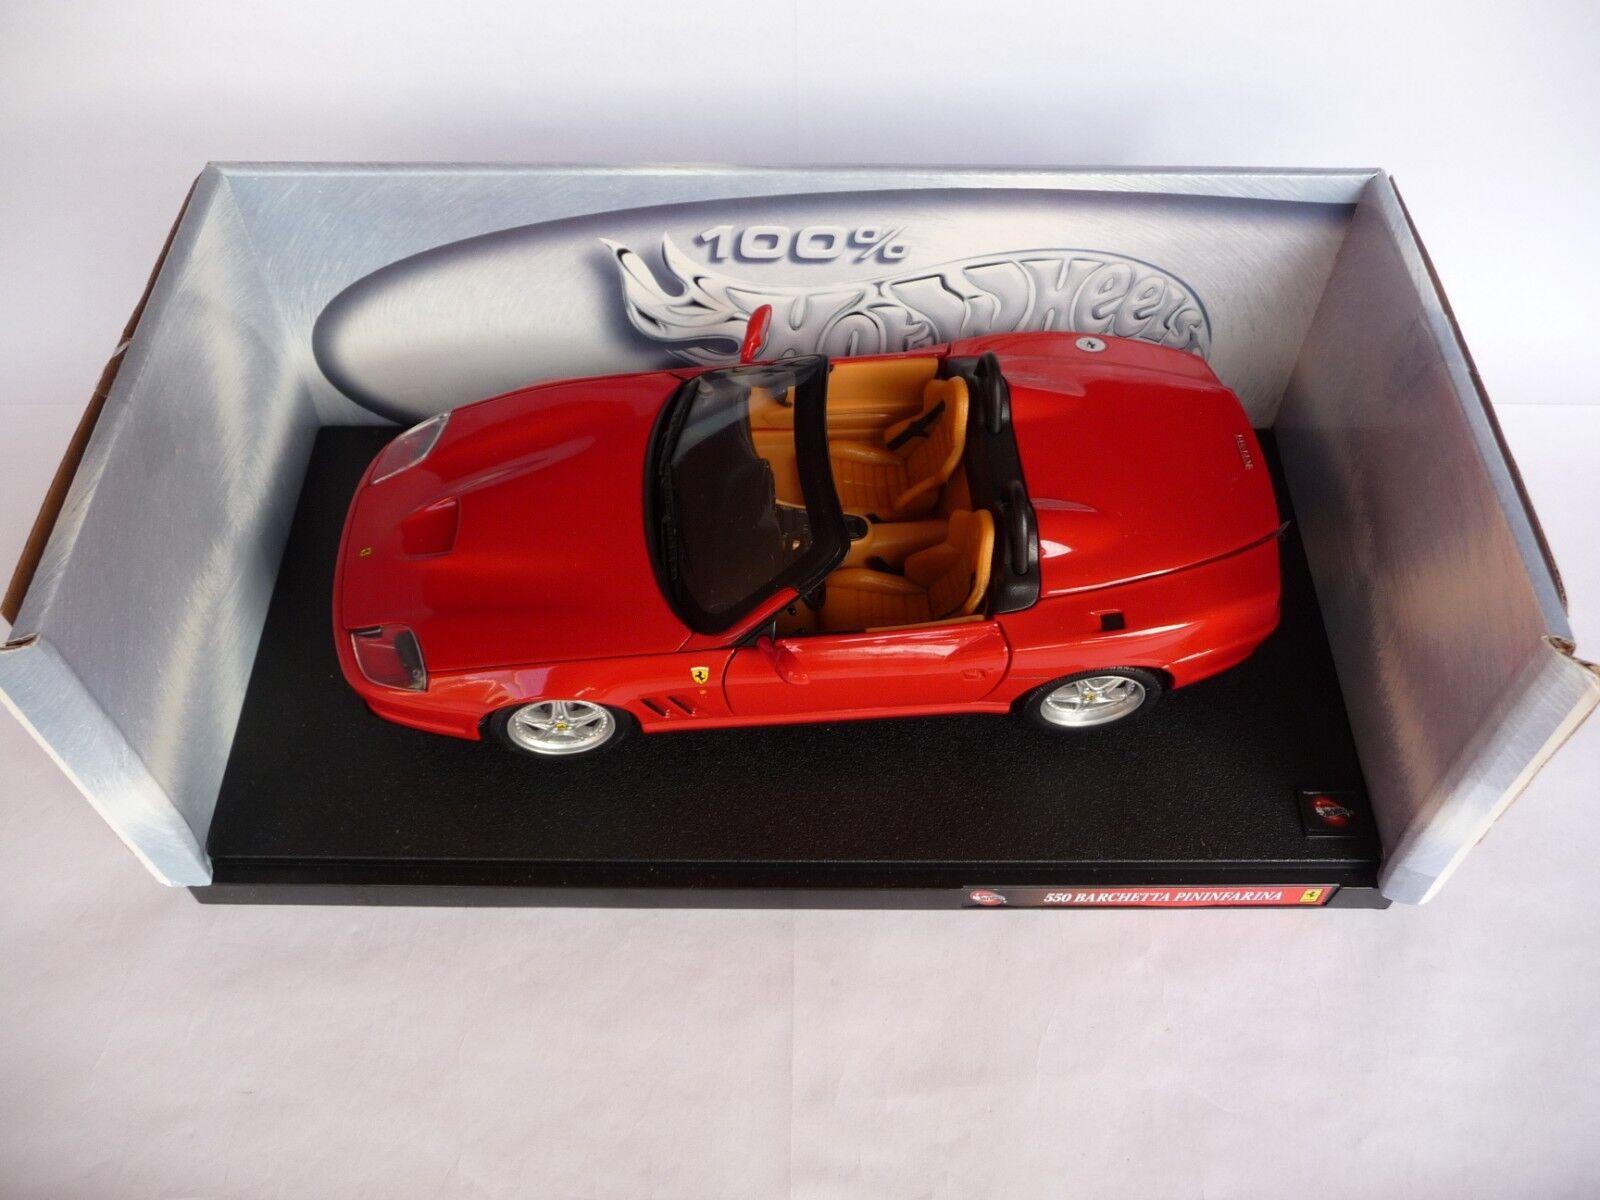 Hot Wheels 1 18 Ferrari 550 Barchetta Pininfarina MAT29441